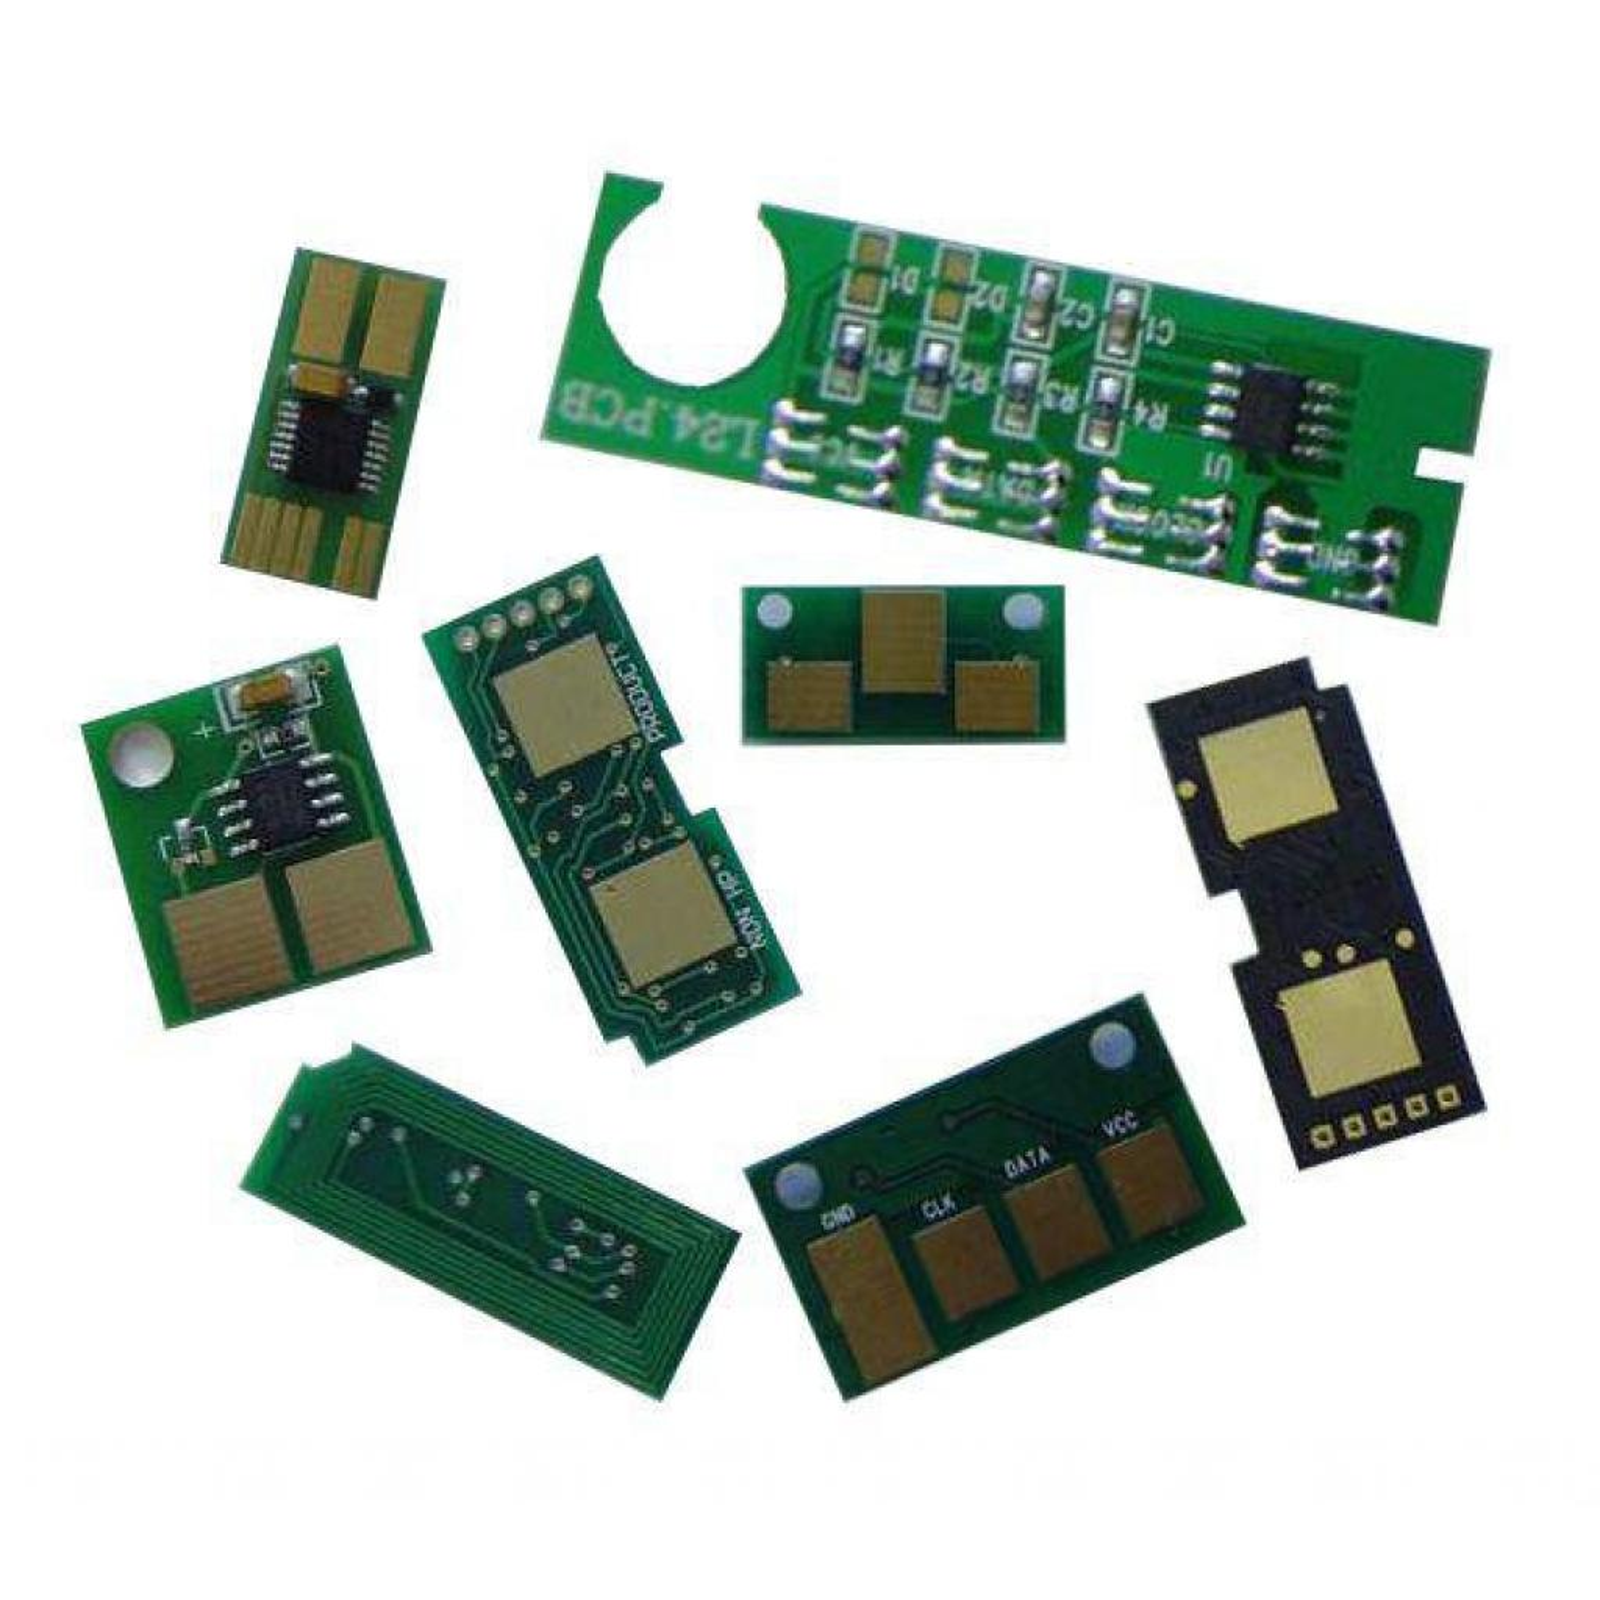 Чип для картриджа CANON 732 ДЛЯ LBP7780 6.4K YELLOW Everprint (CHIP-CAN-LBP7780-Y)